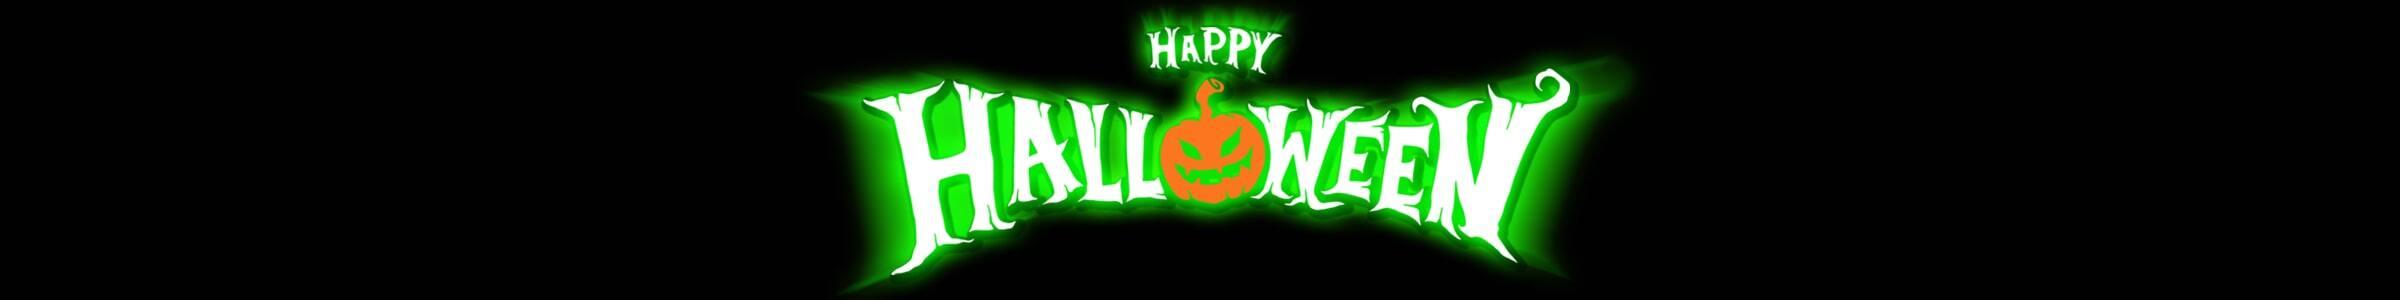 Category_Teaser_Header_Halloween_2021_2400x300